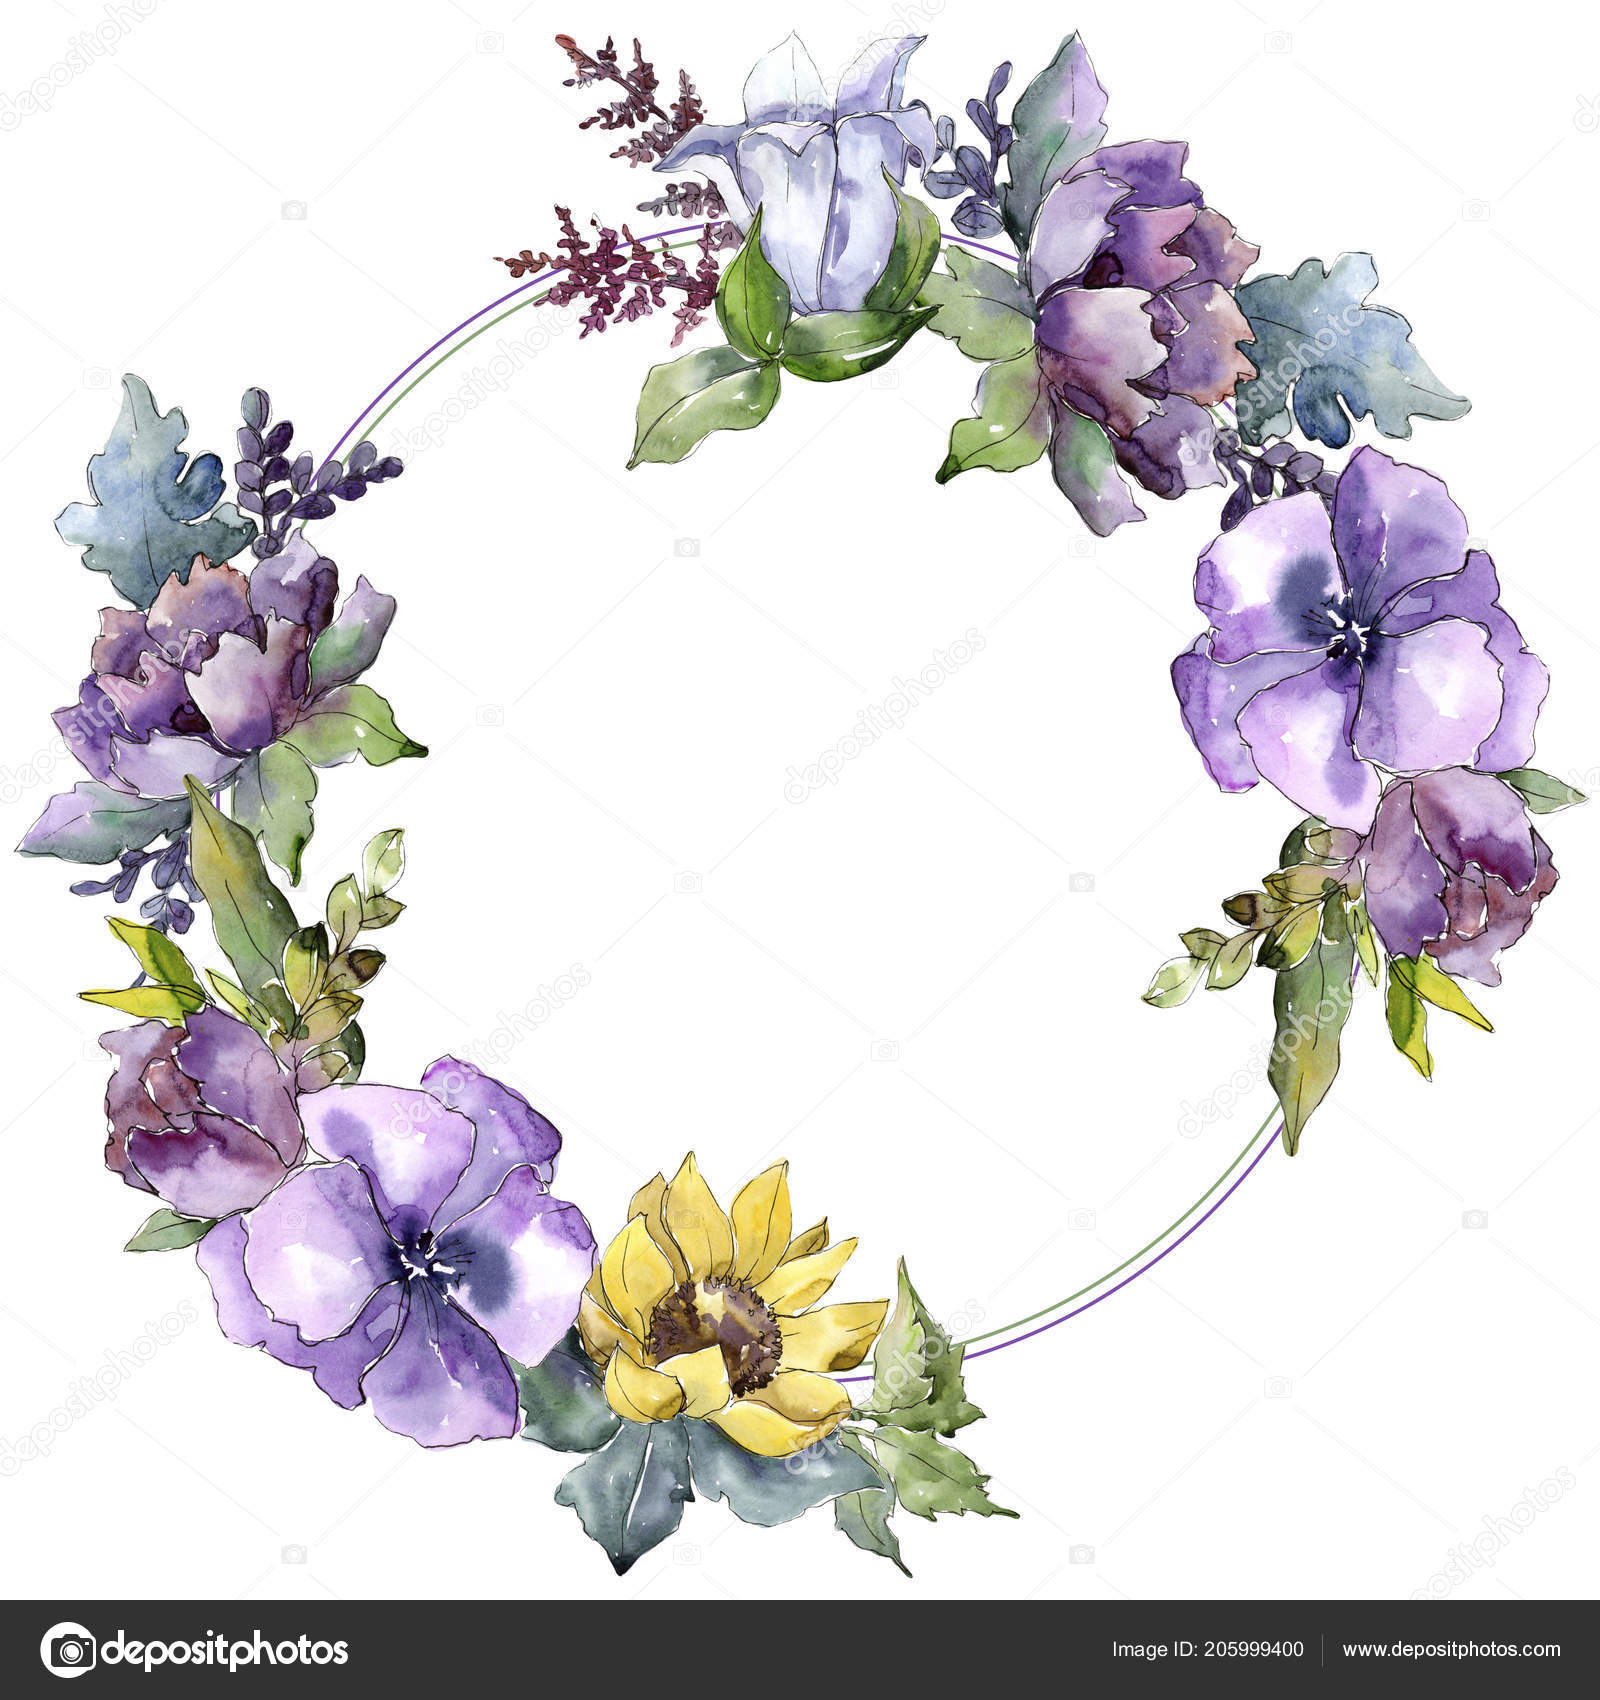 Watercolor Bouquet Flowers Floral Botanical Flower Frame Border